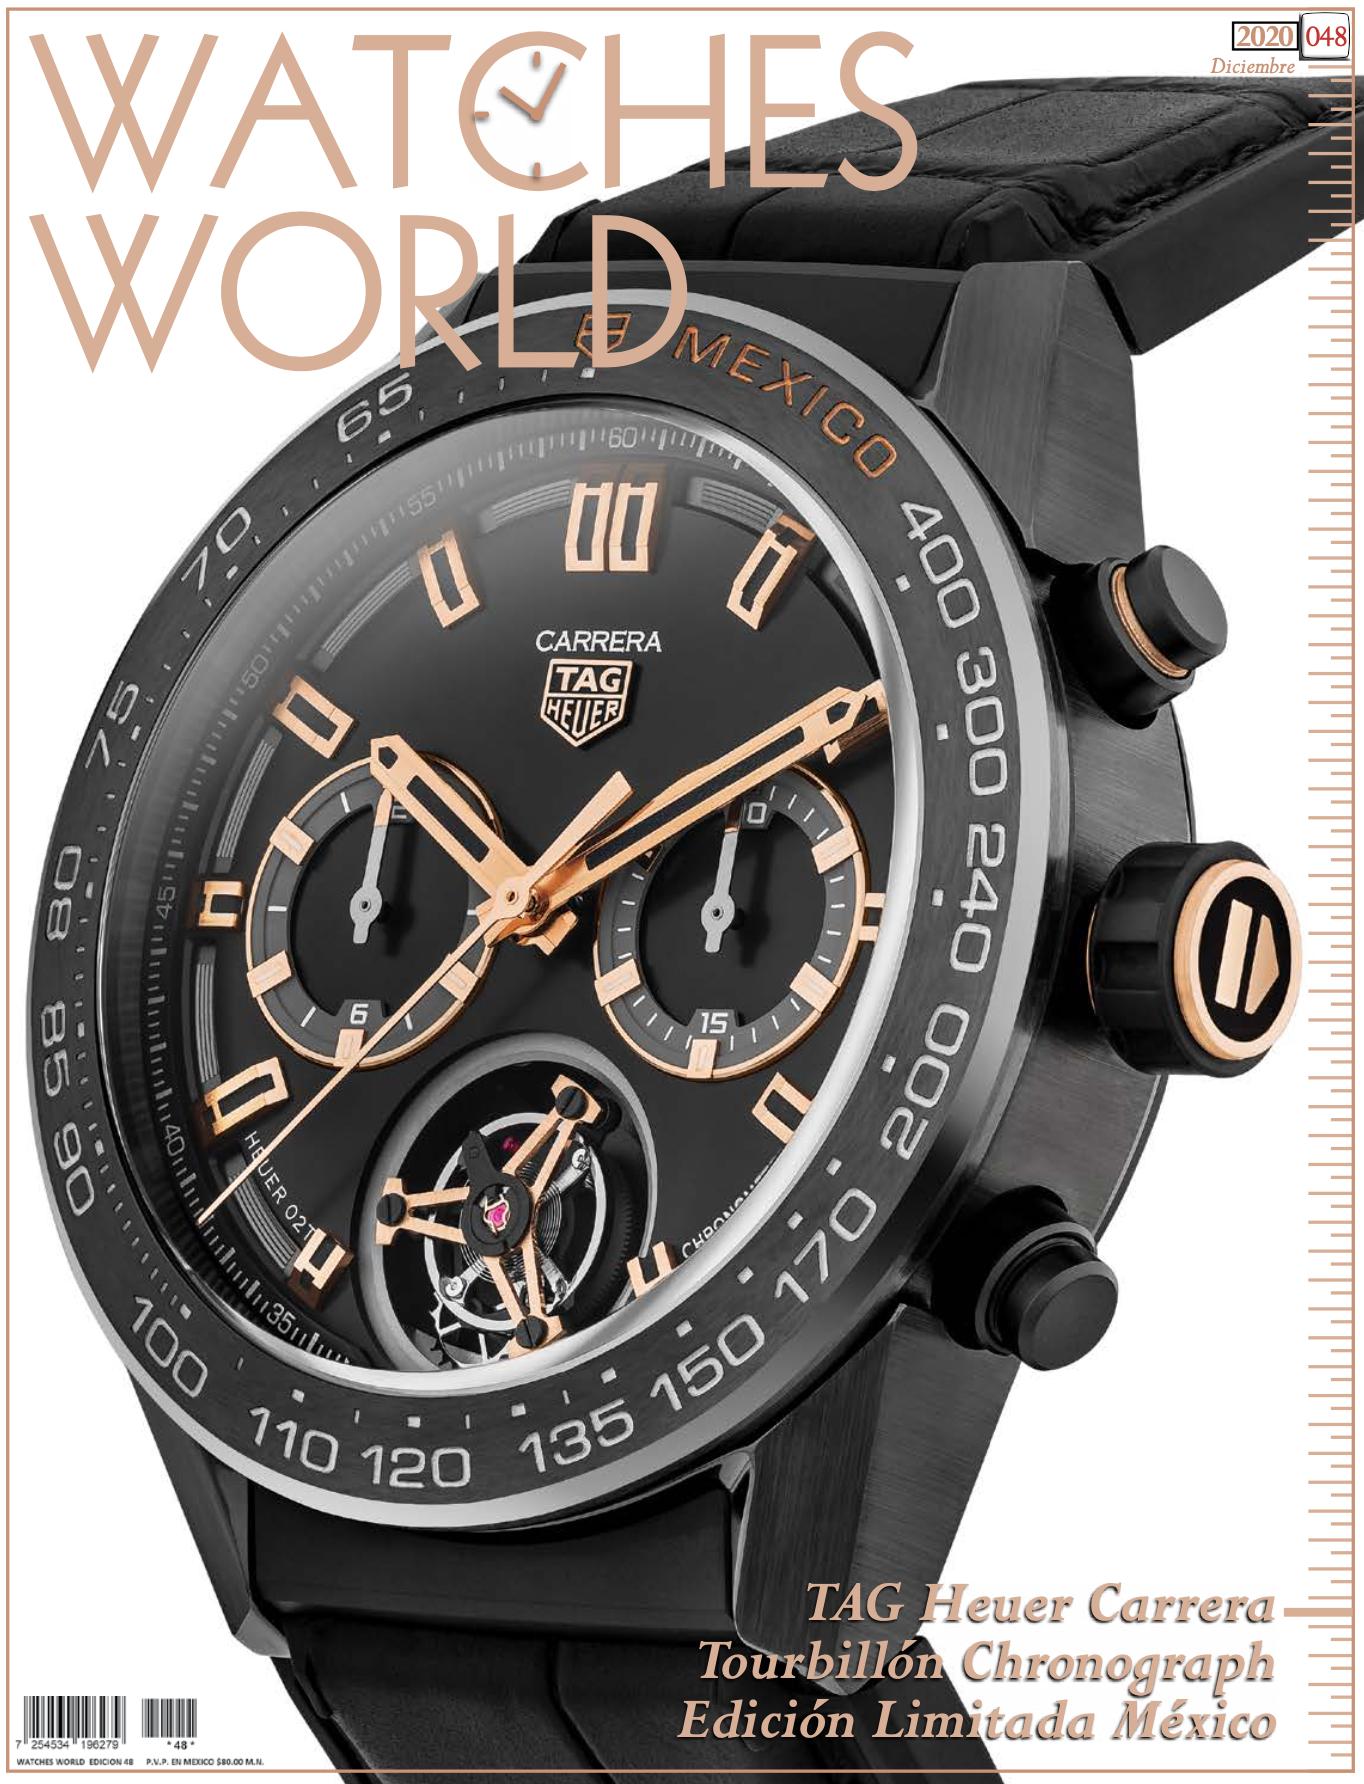 Watches World Diciembre 2020